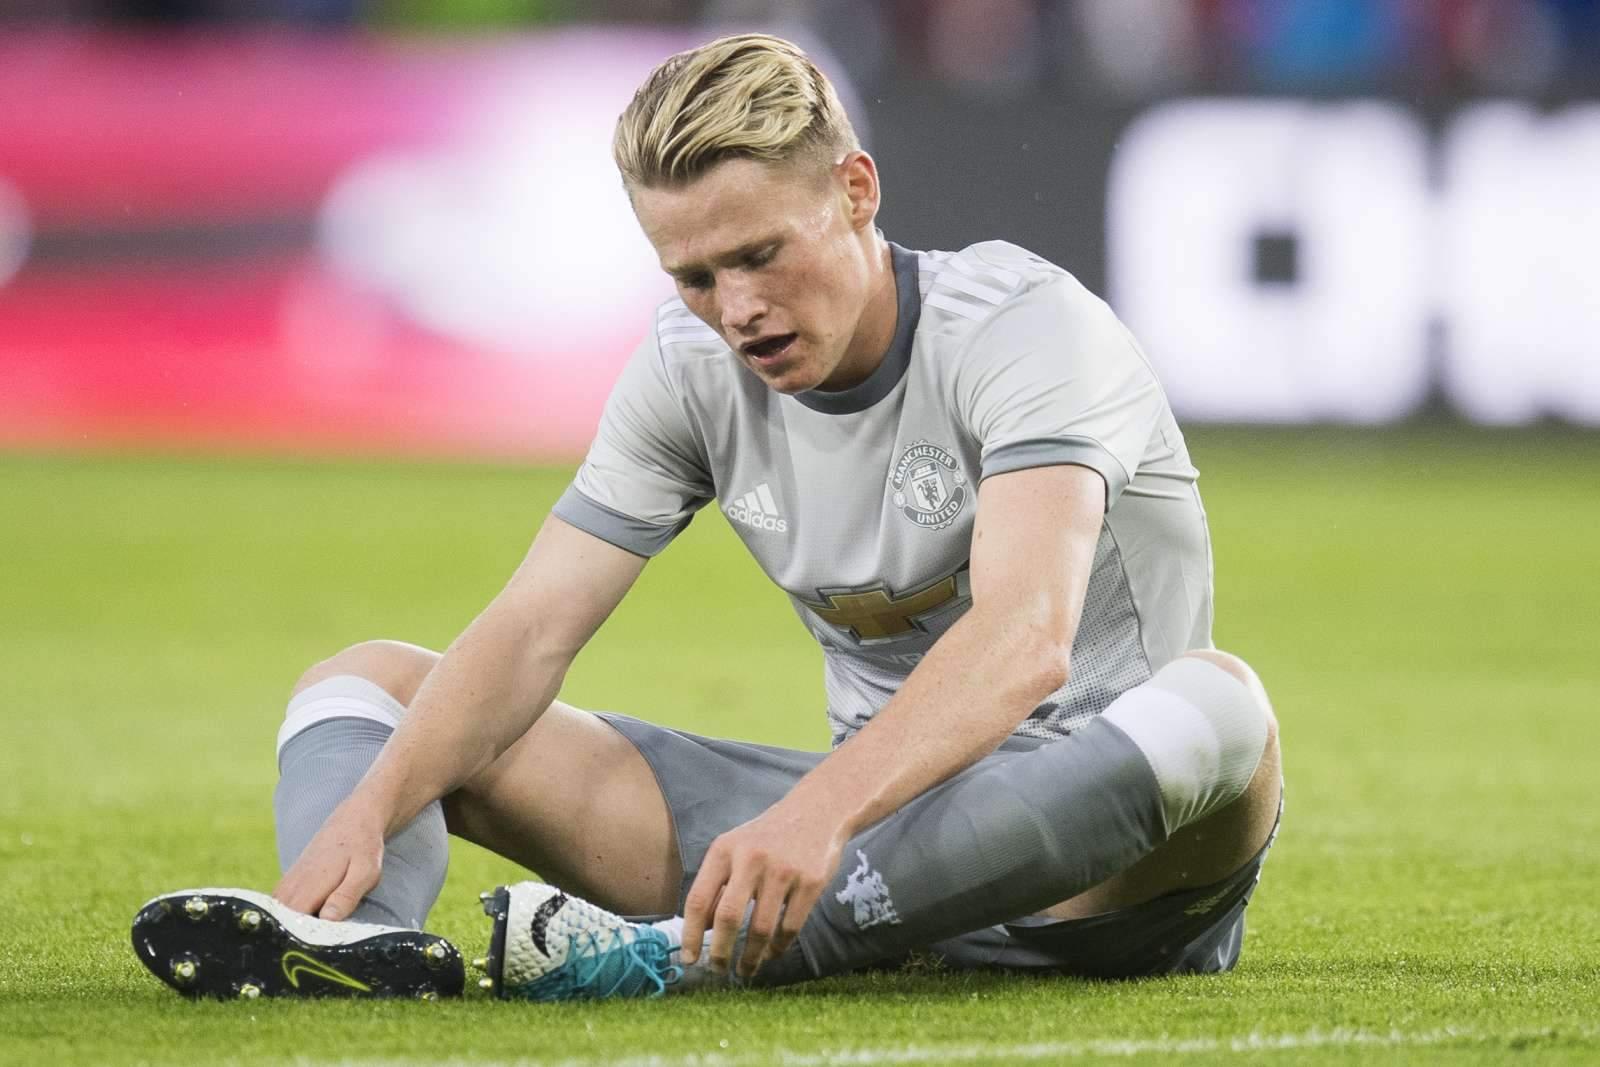 Быстрый гол позволил «Манчестер Юнайтед» пройти «Уотфорд»